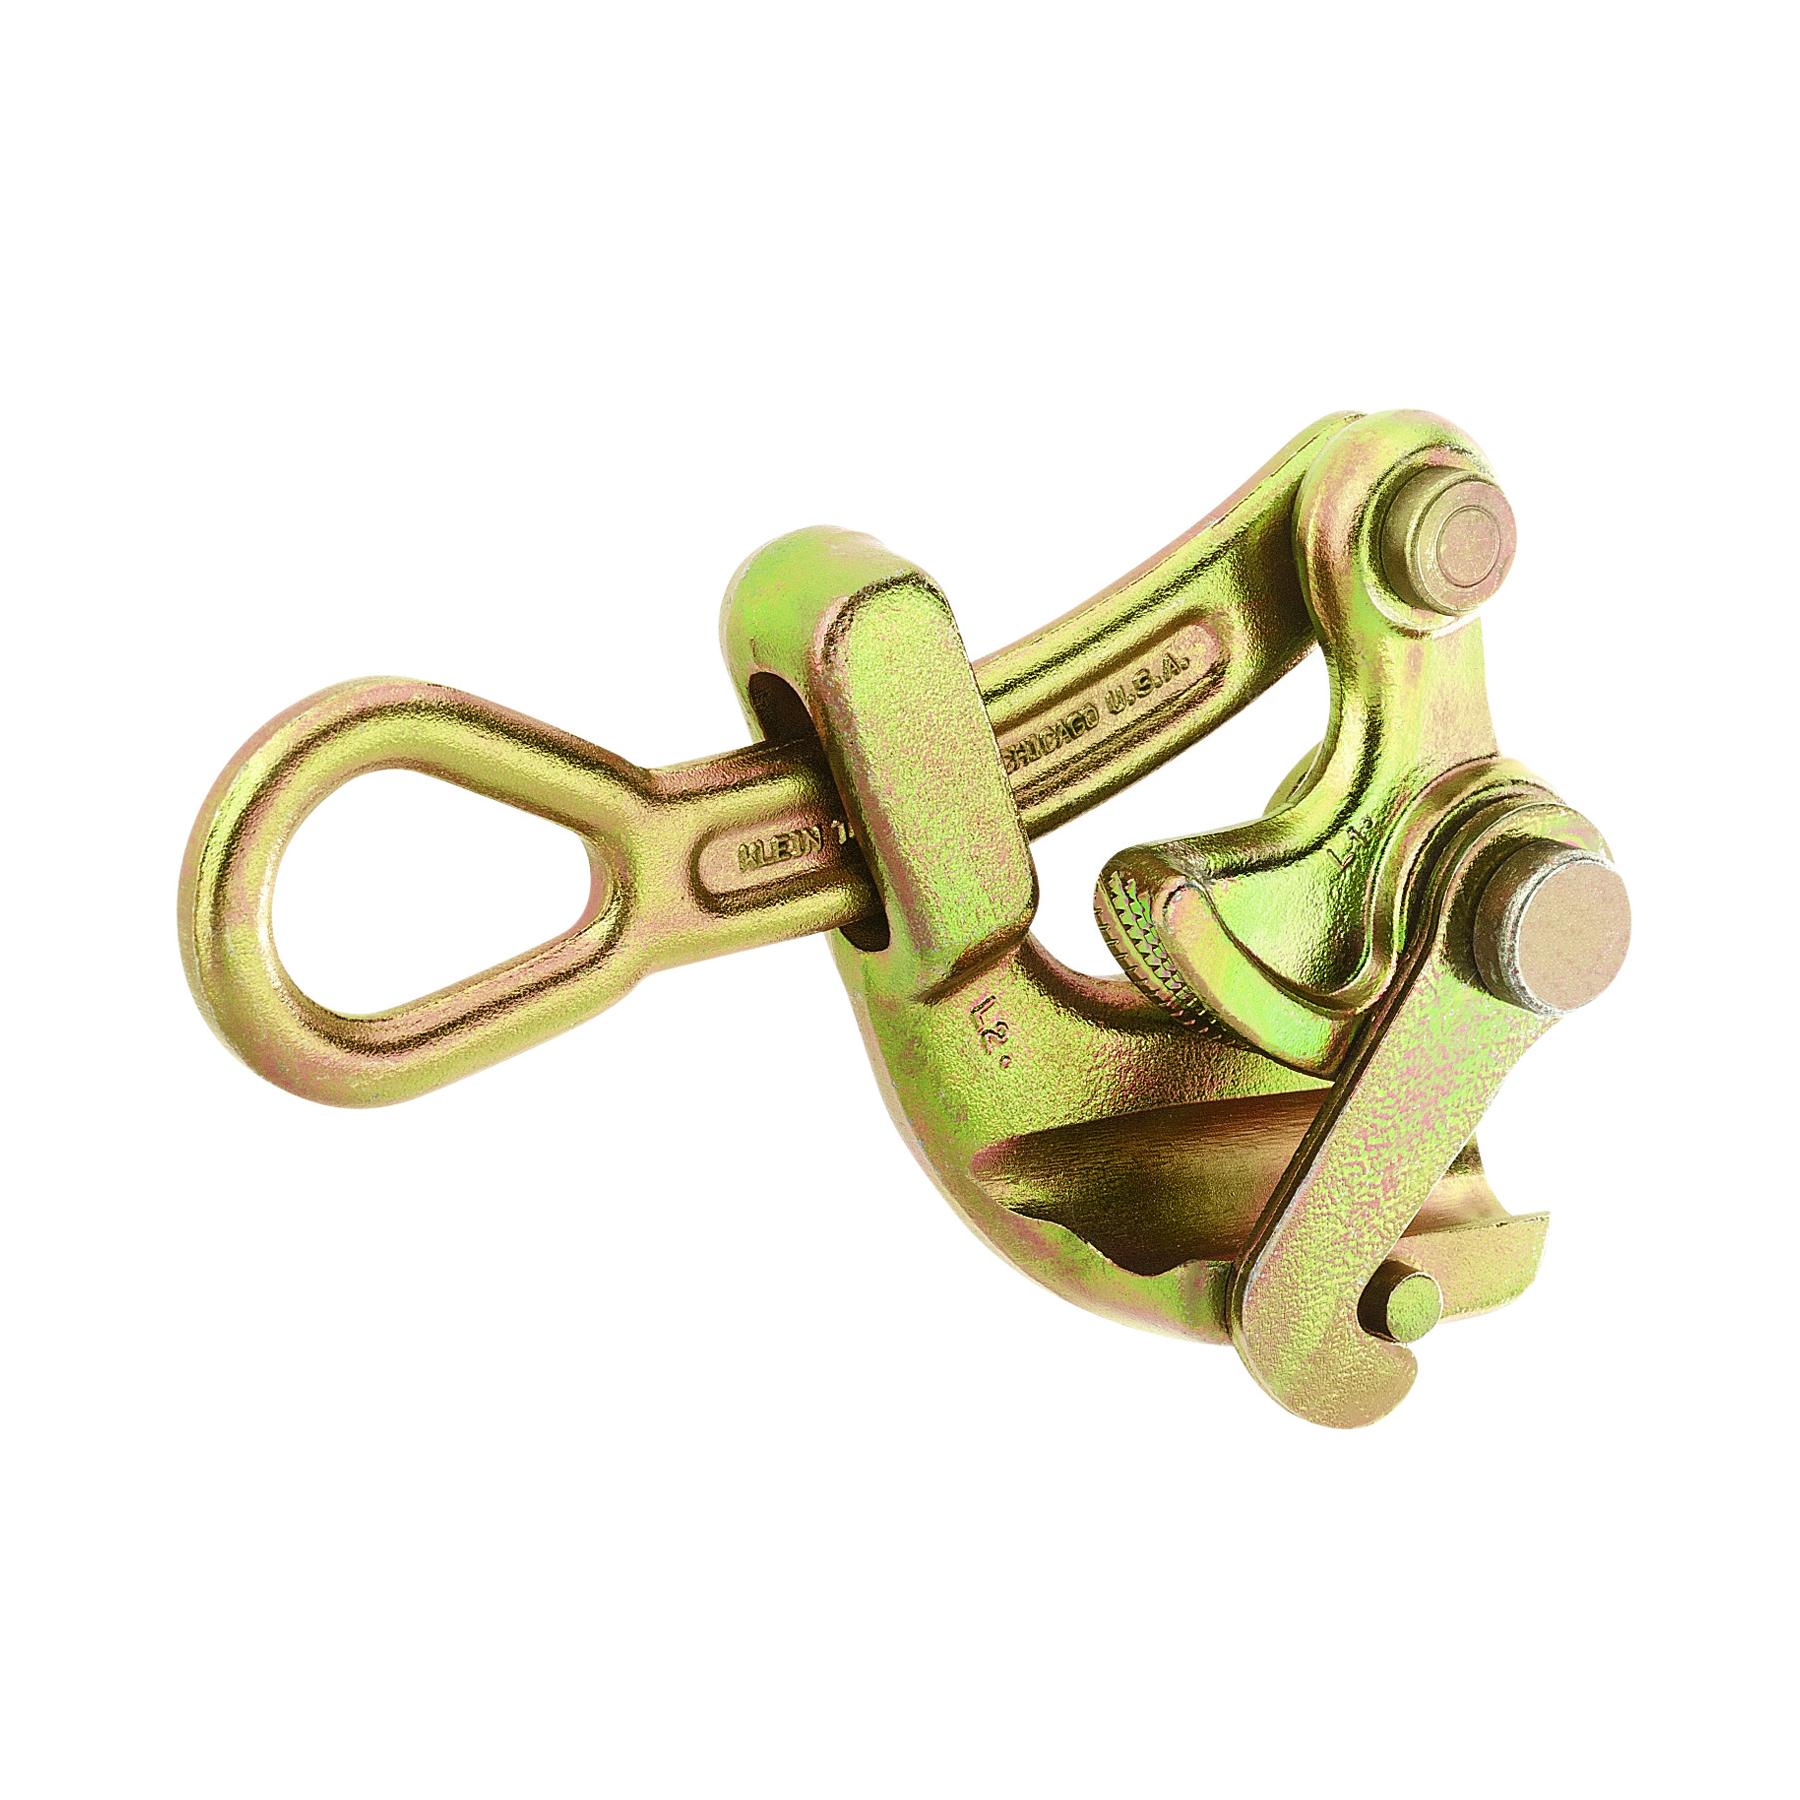 Klein Havens® Grip for Wire Rope 1-Inch - 162520-1 | Klein Tools ...